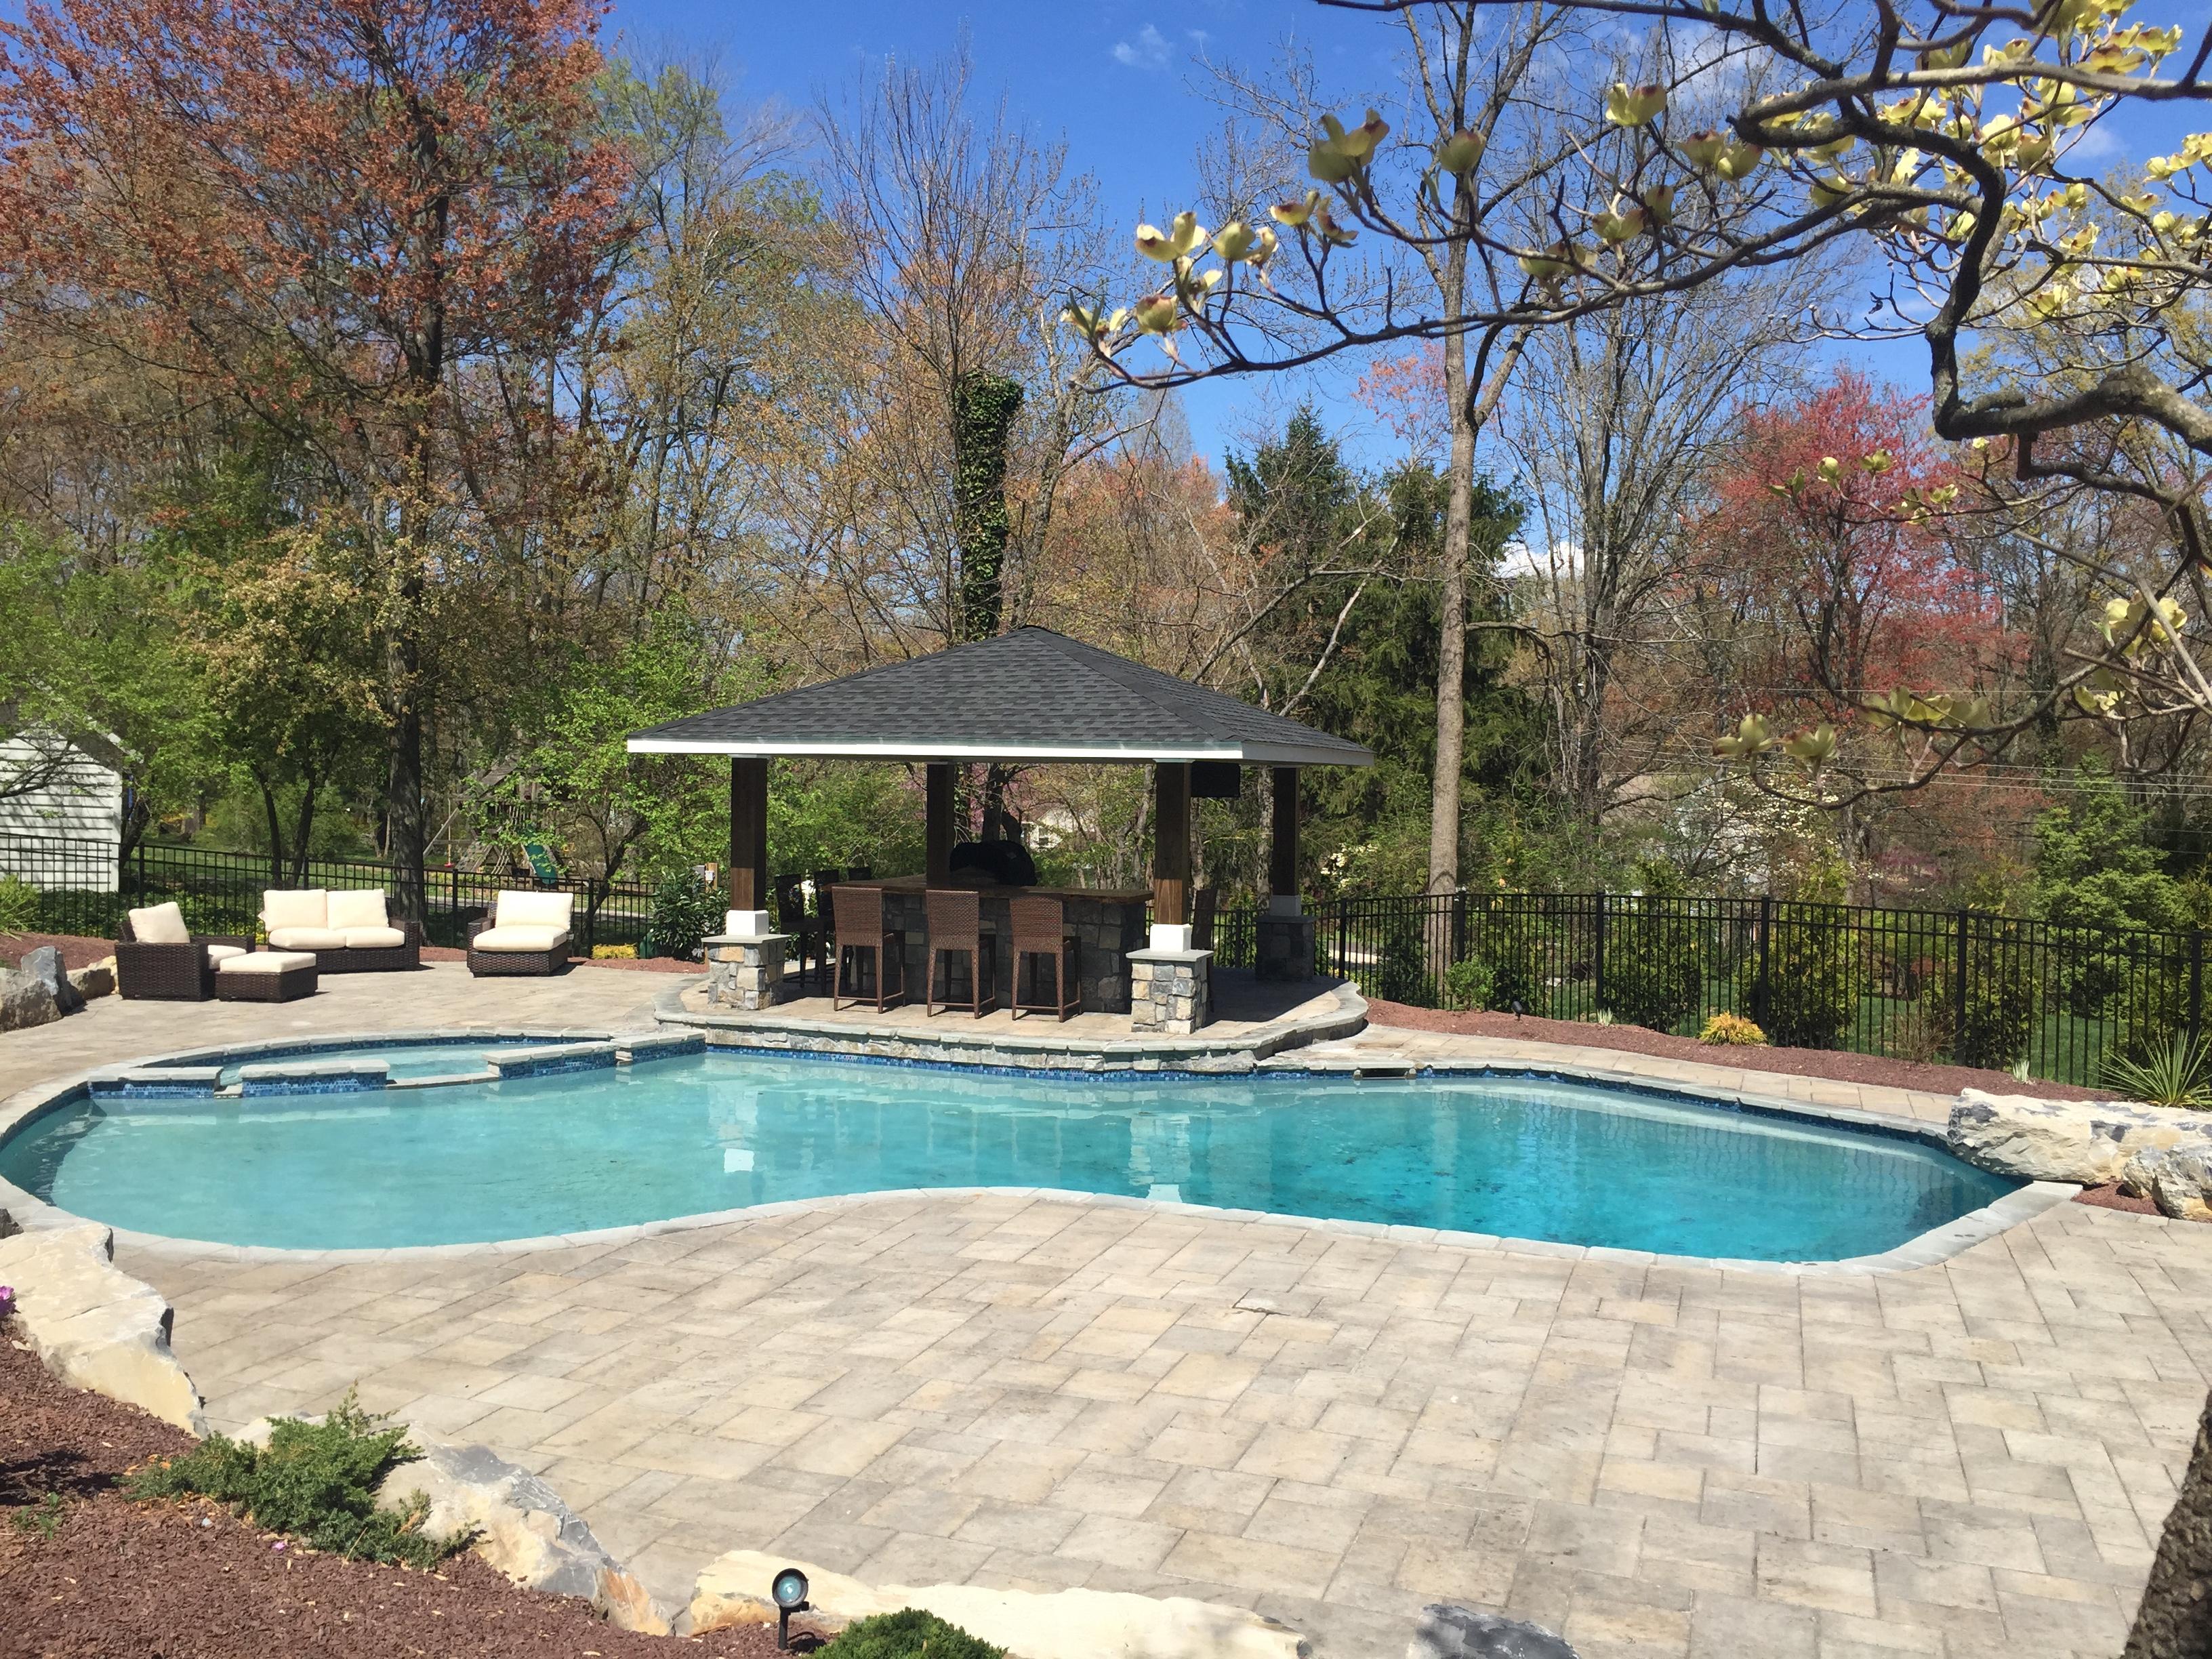 Swimming Pool w/ Paver Pool Deck and Gazebo - Garden Patios ...